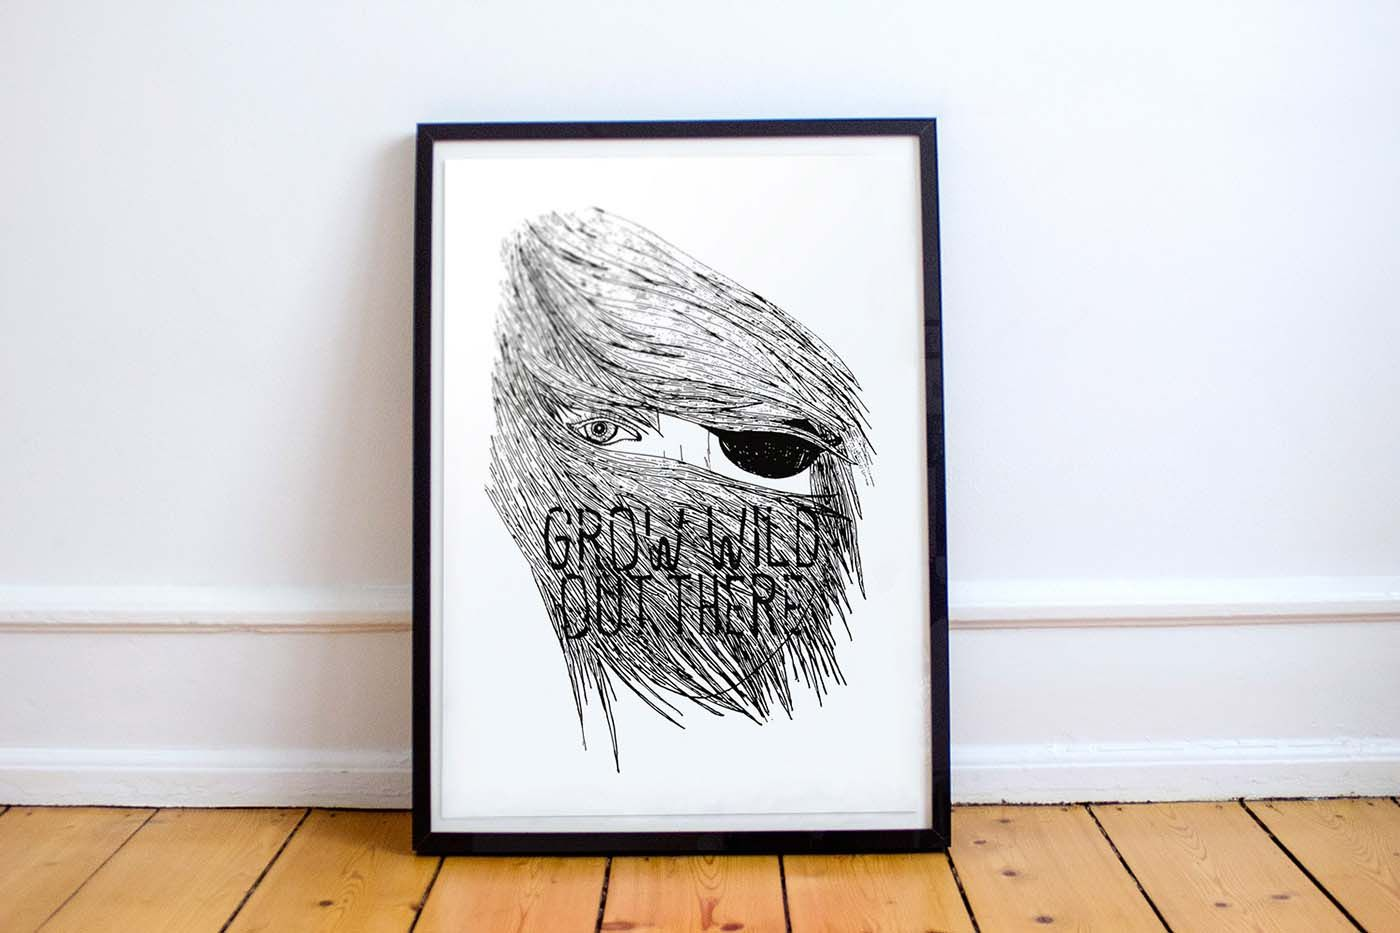 Poster design mockup - Enjoy A Set Of 2 Free Poster Frame Psd Mockups And Their Realistic Design Have